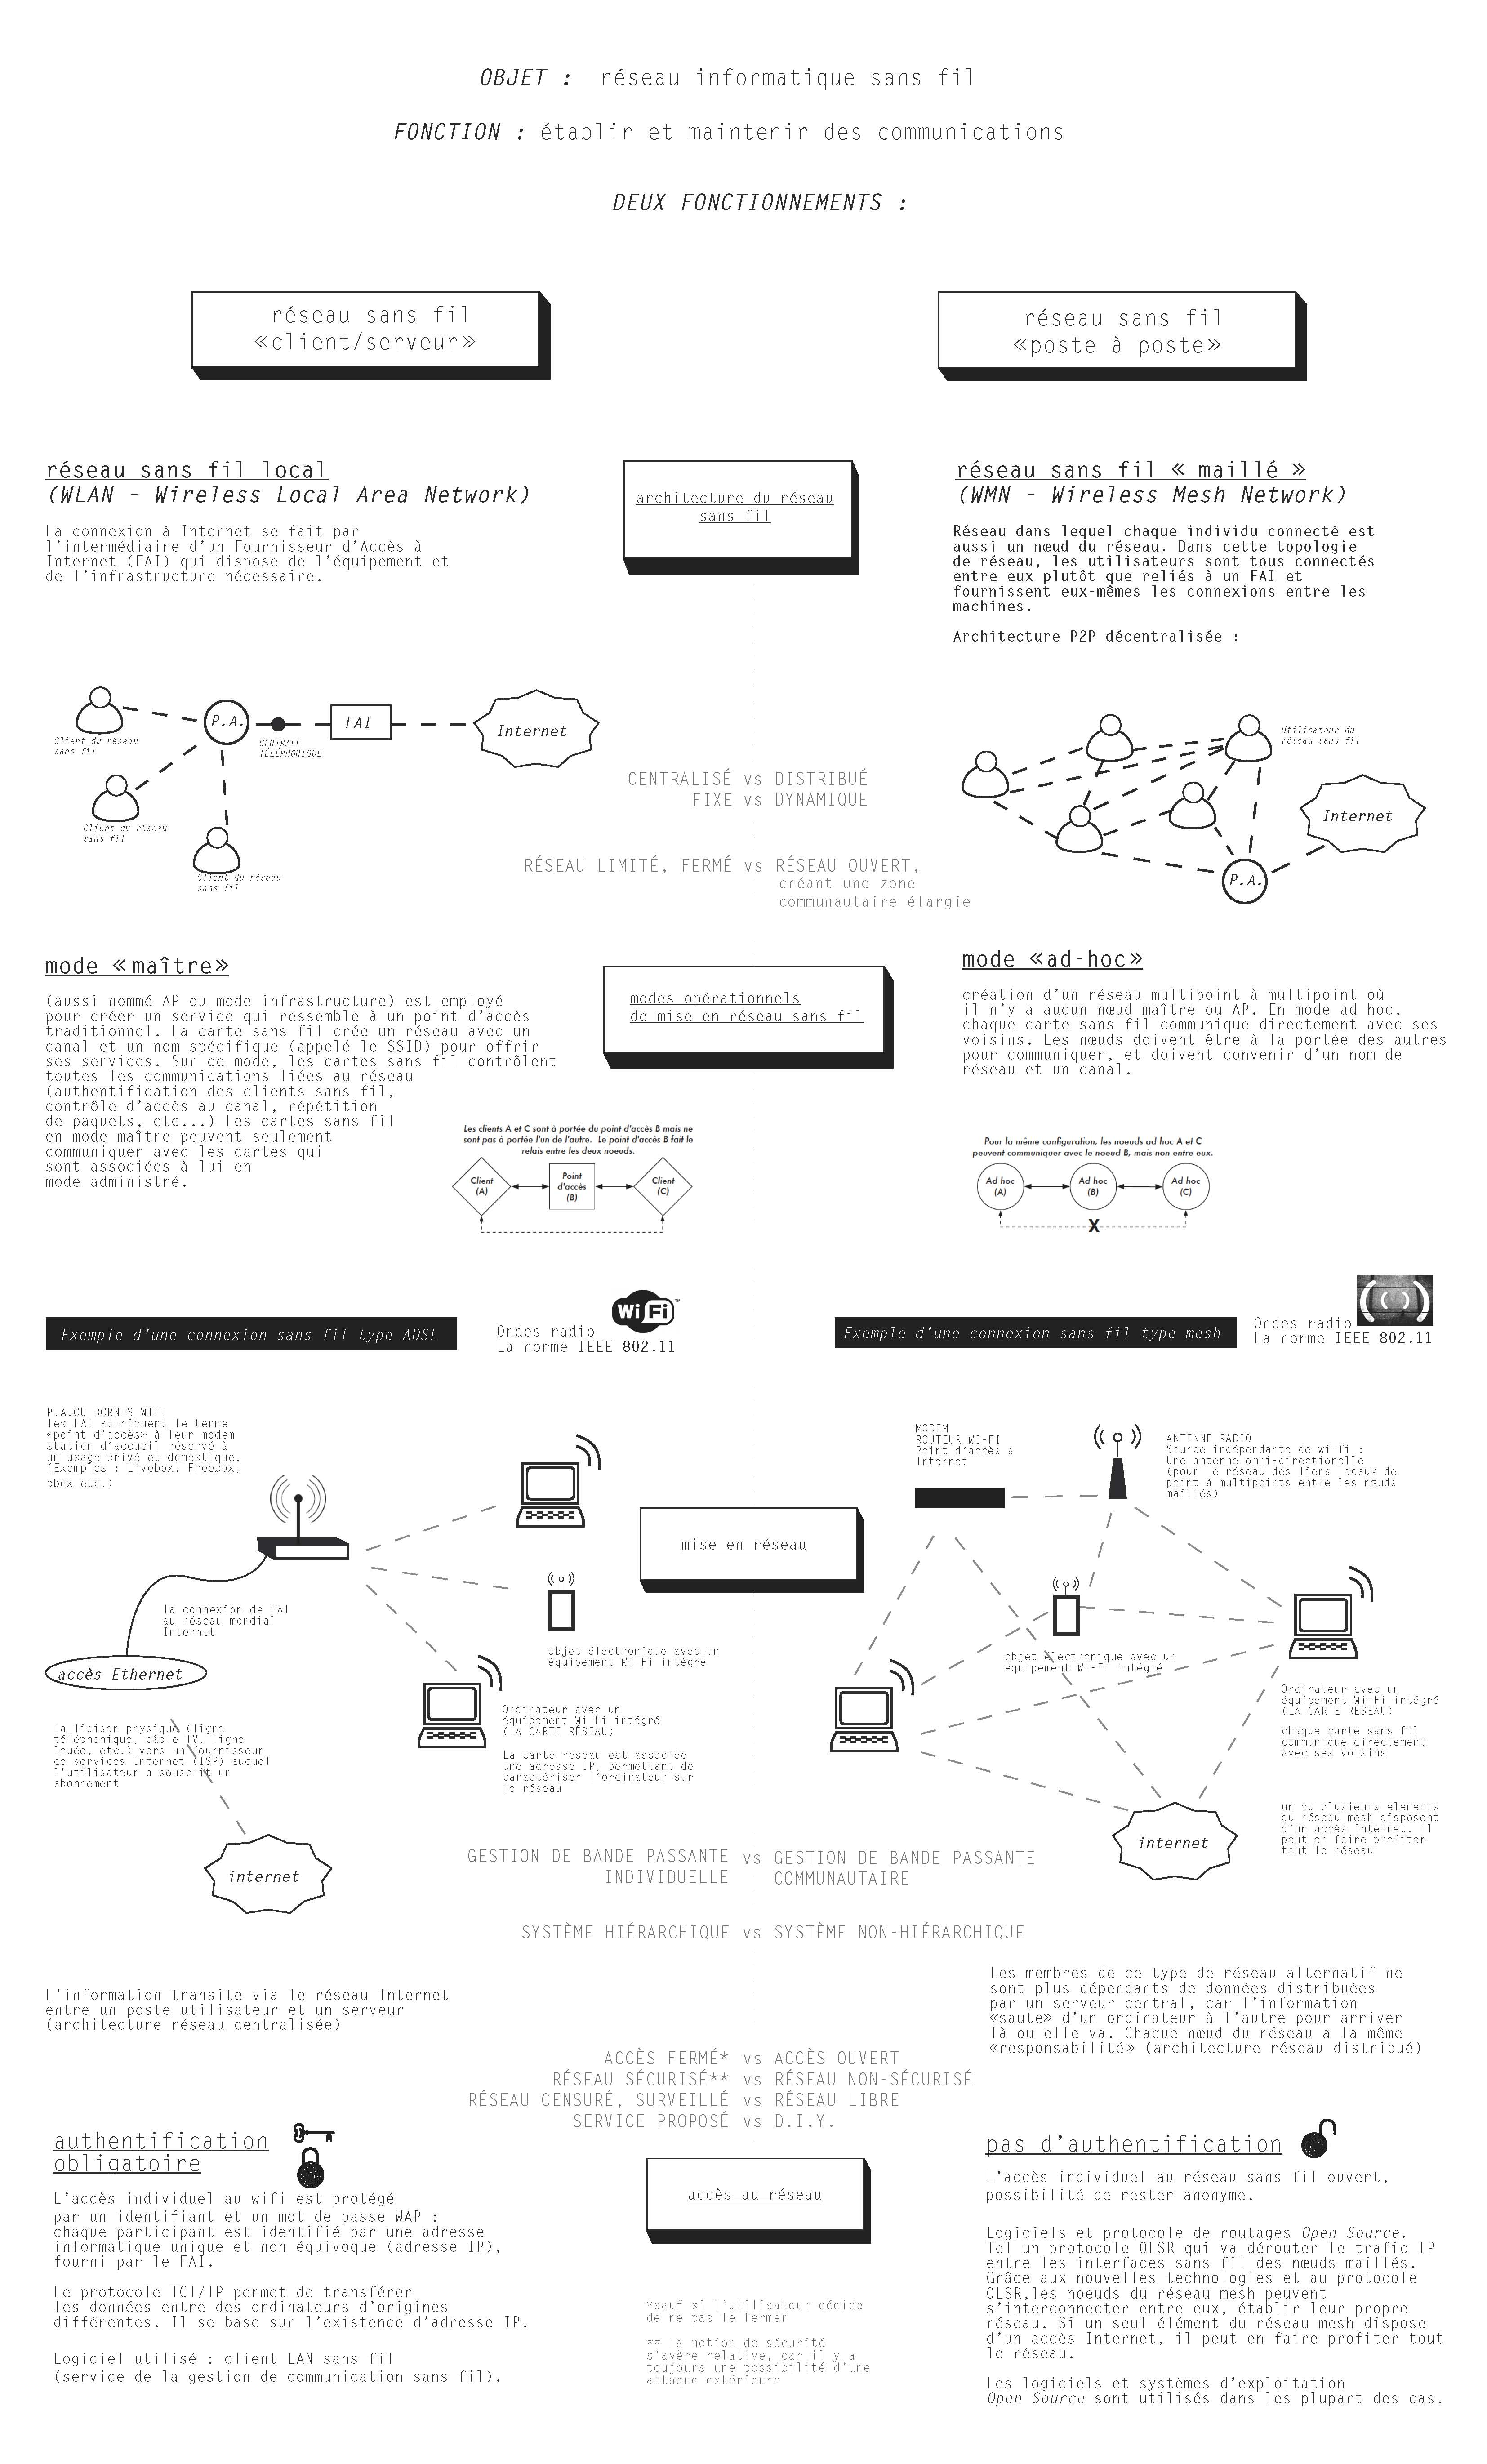 WLAN vs WMN_poster